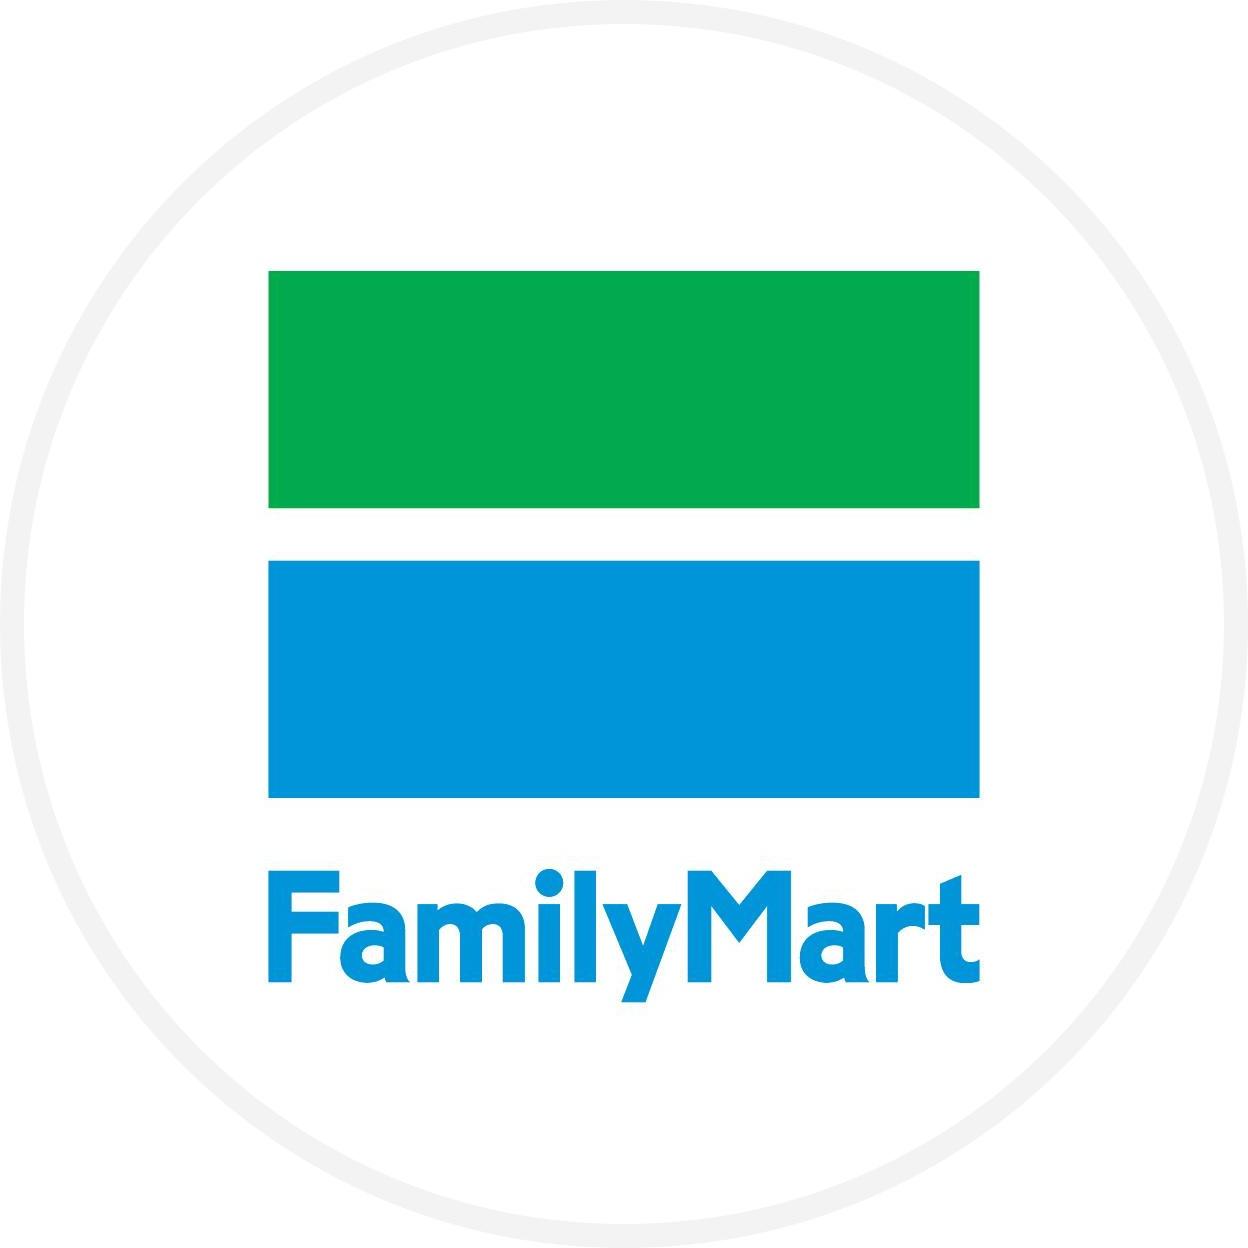 FamilyMart แฟมิลี่มาร์ท